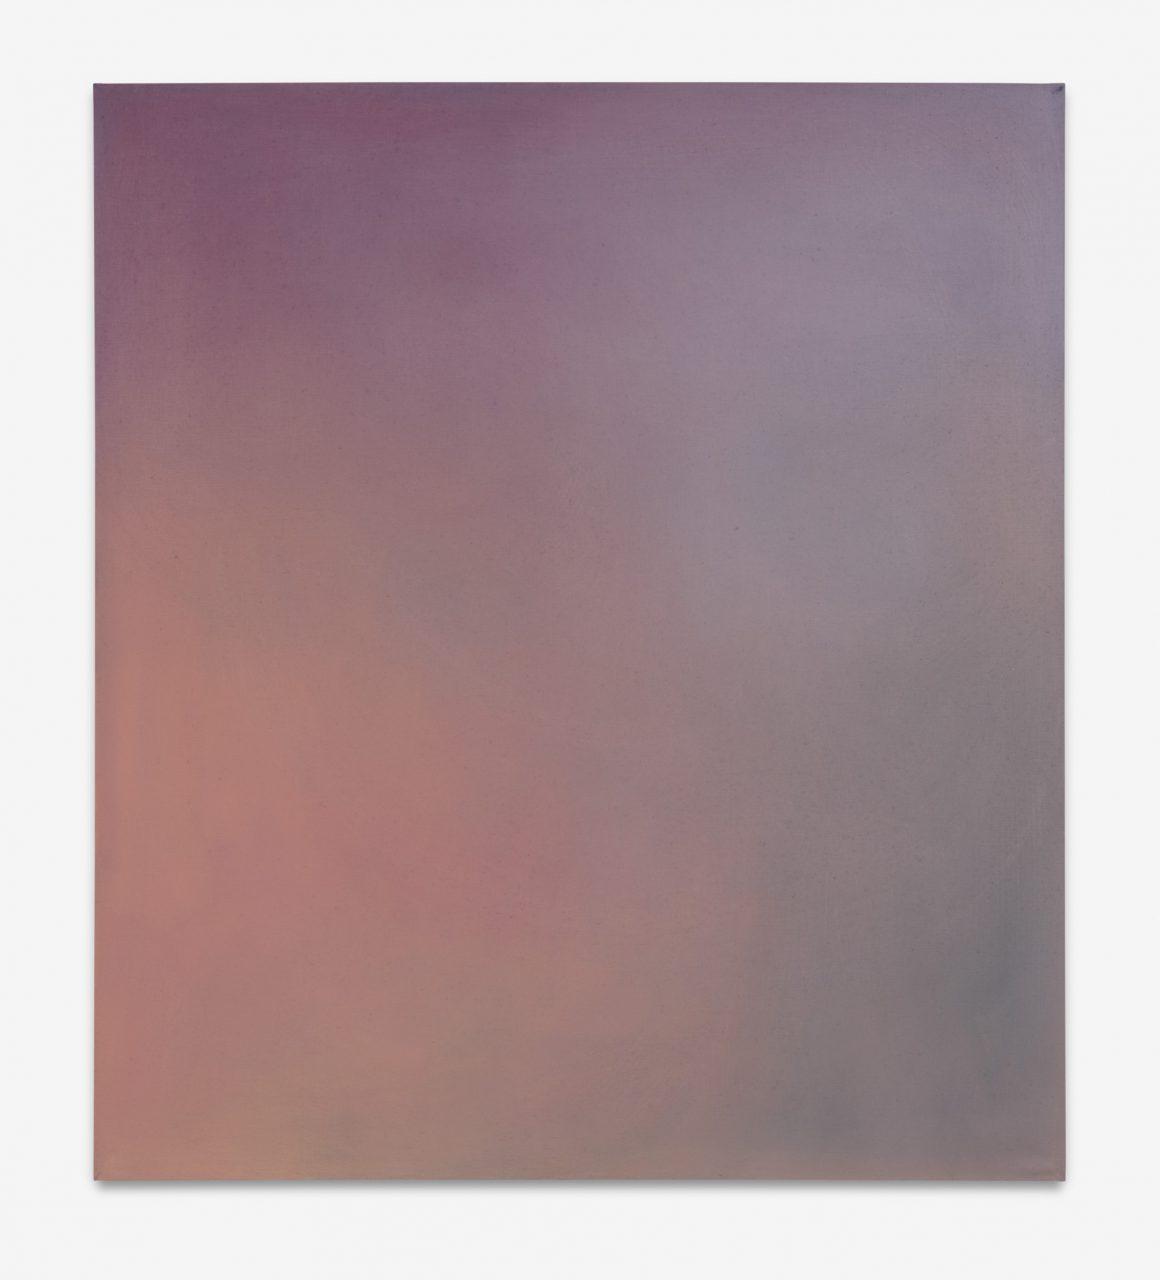 Prehistoric Sunset MIII 2109 180x160cm oil on canvas